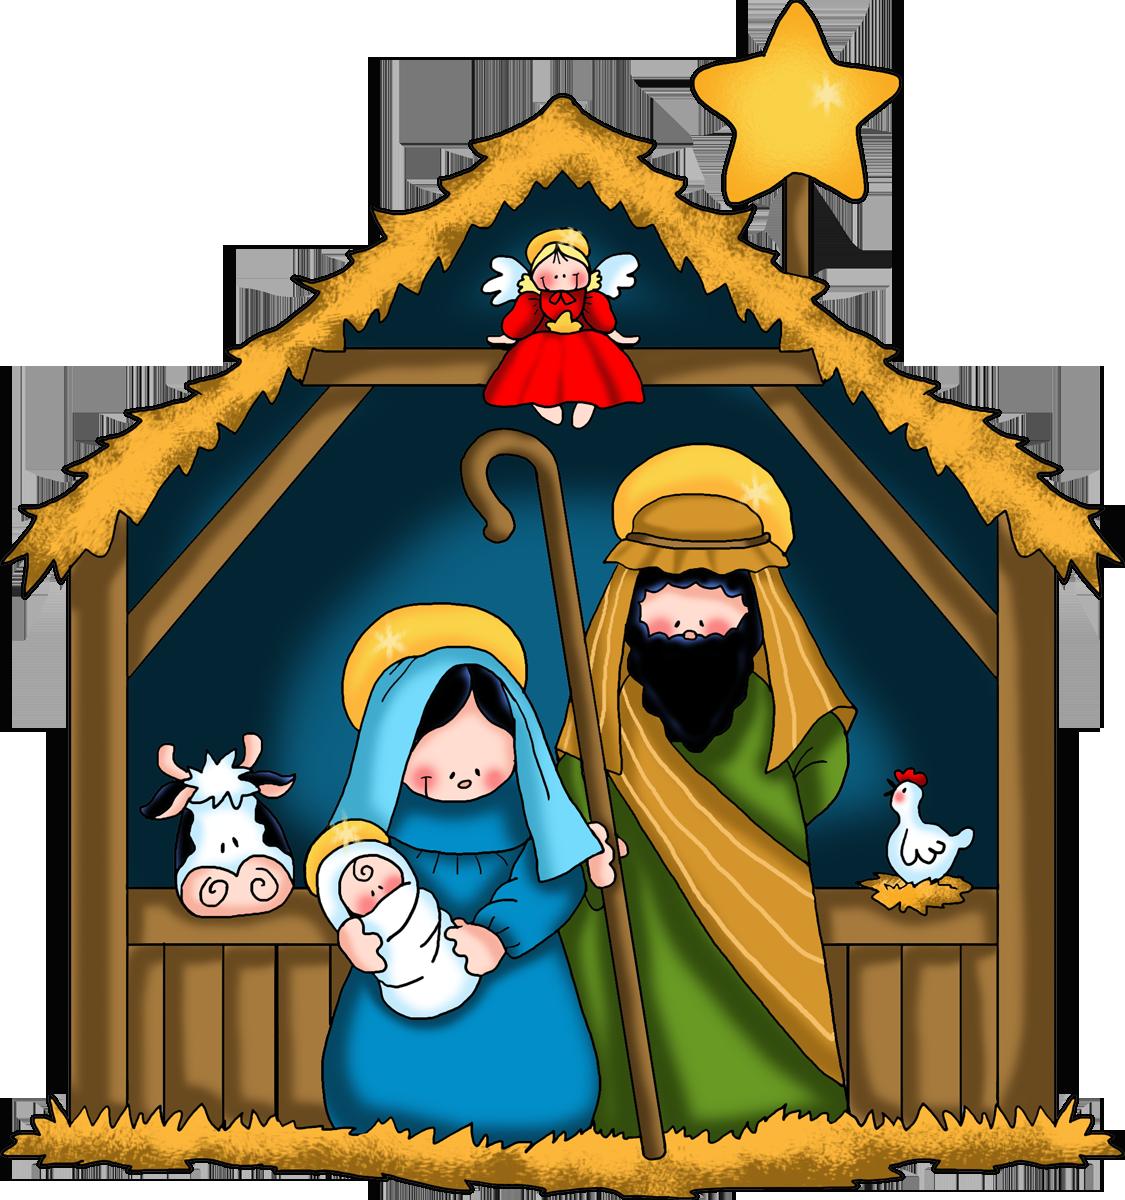 Nativity Scene Clipart New Calendar Temp-Nativity Scene Clipart New Calendar Template Site-3